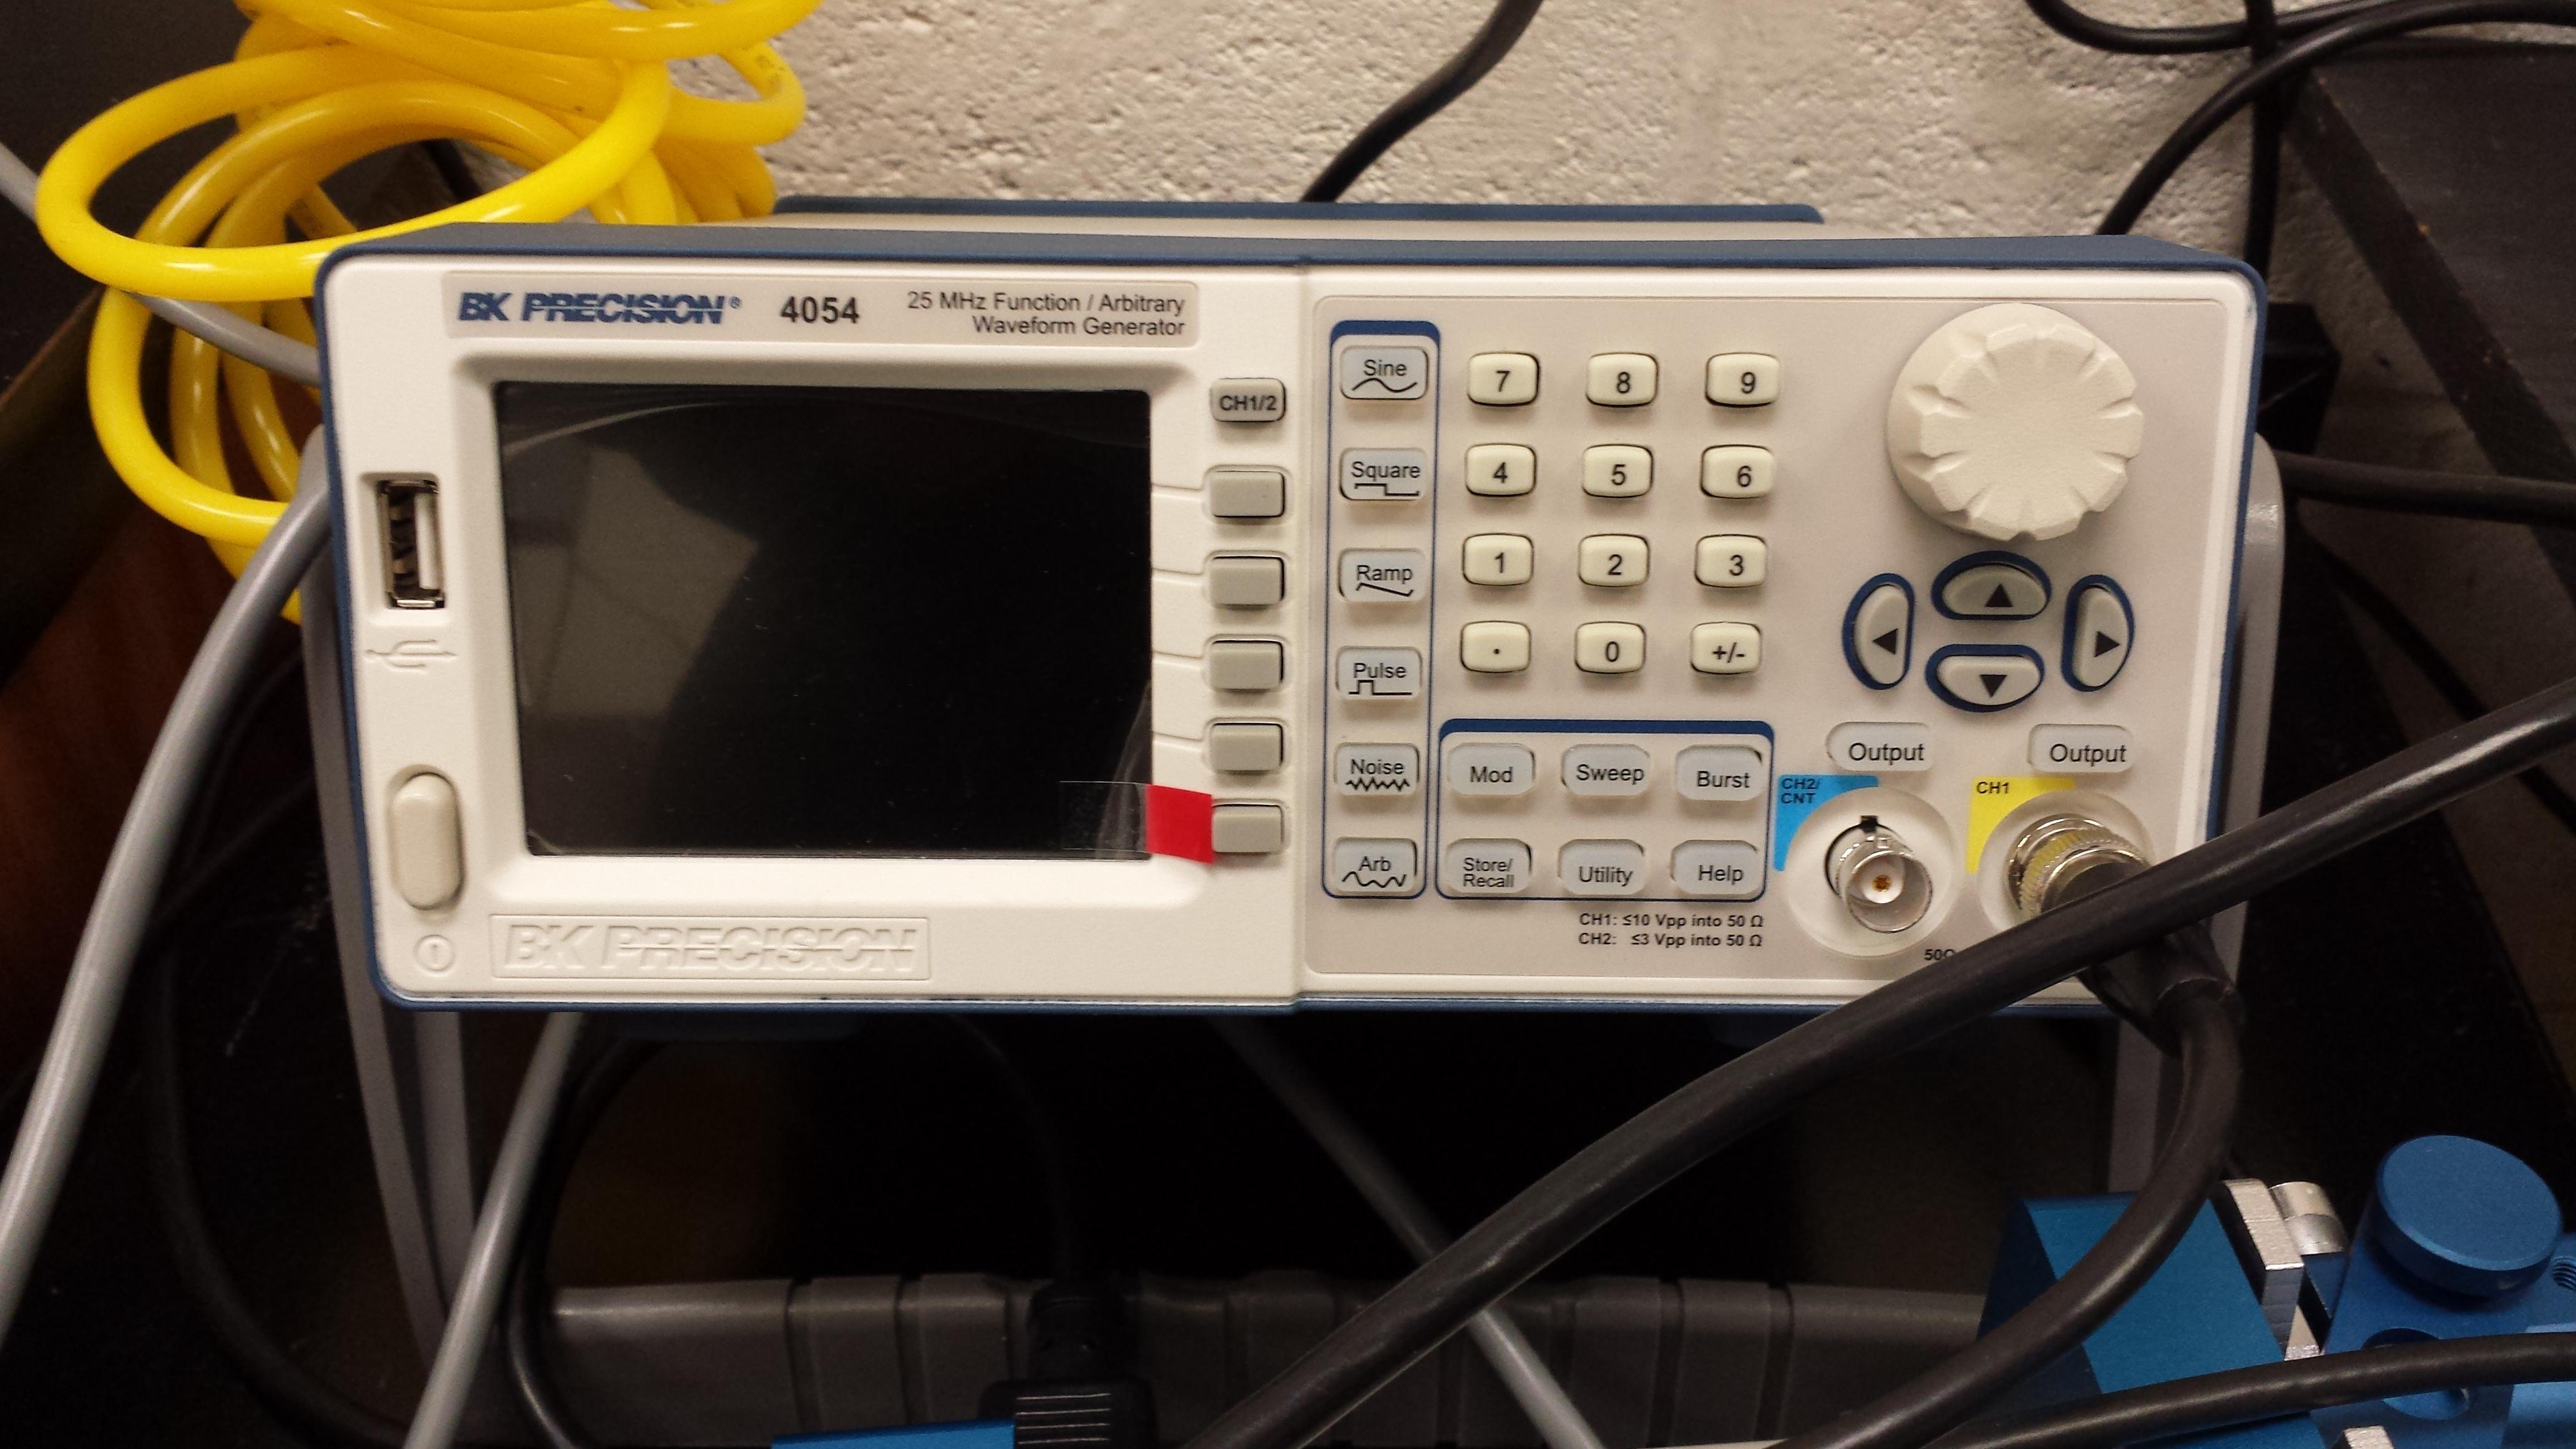 Function Generator (BK Precision 4054)